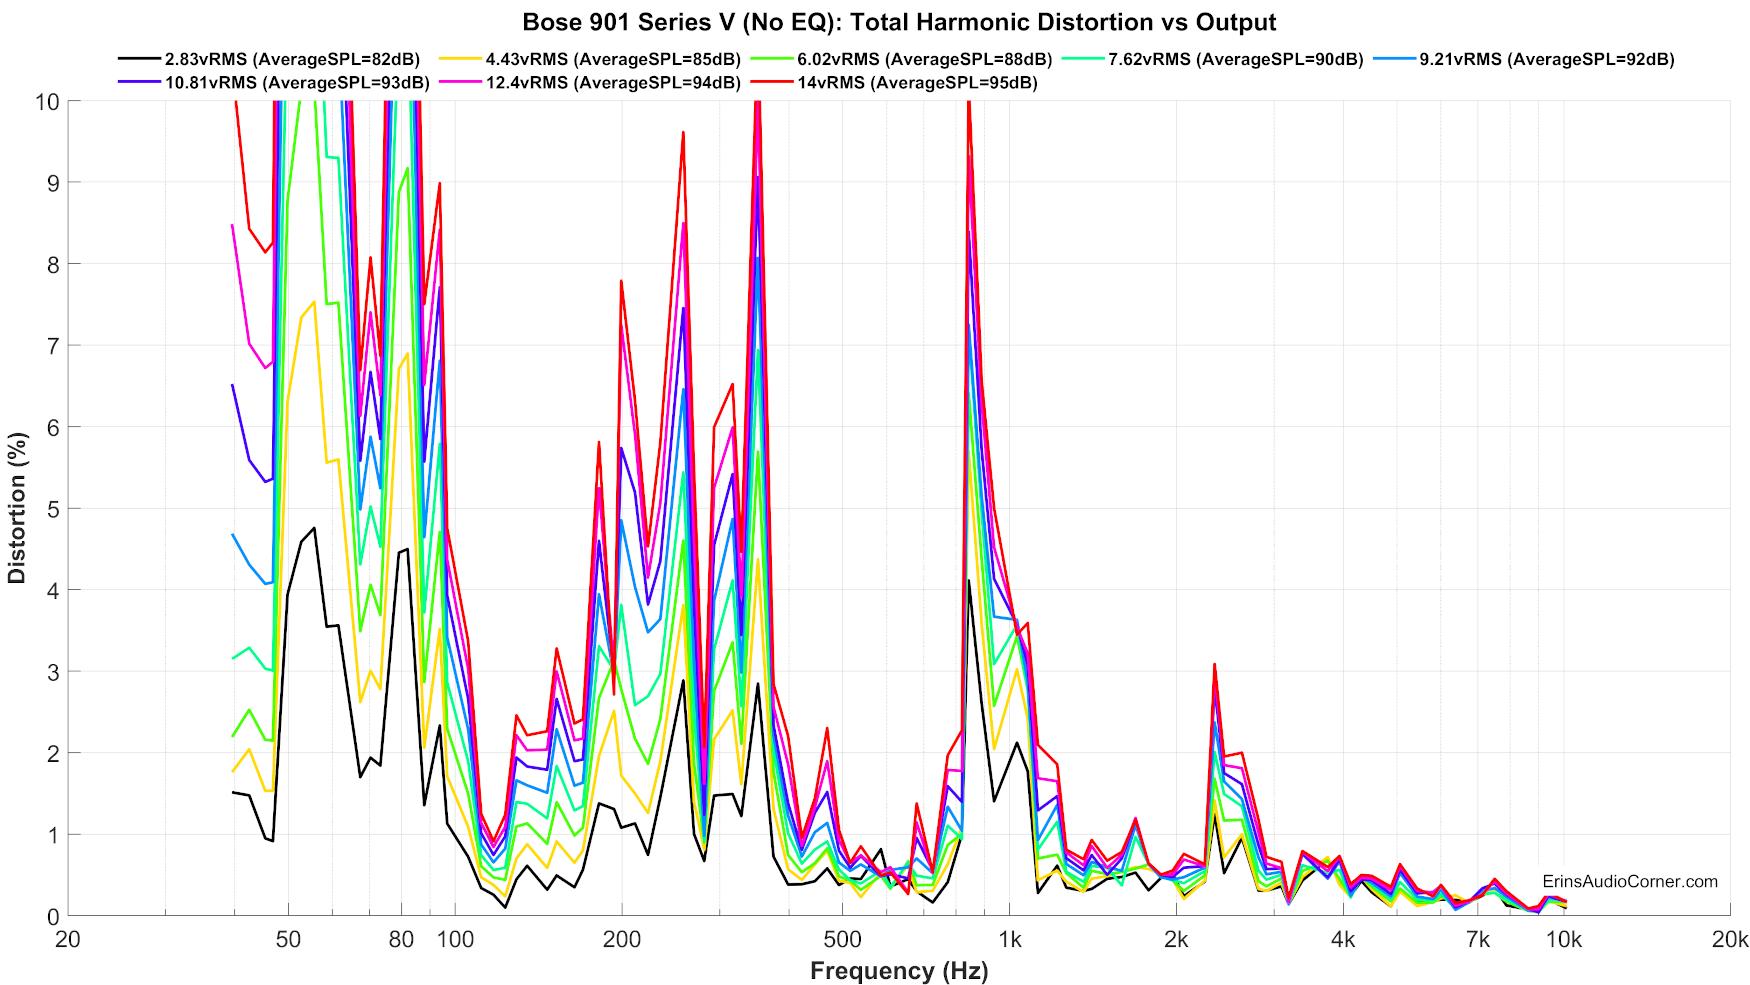 Bose%20901%20Series%20V%20(No%20EQ)_harmonicDistortion_linear_zoom.png